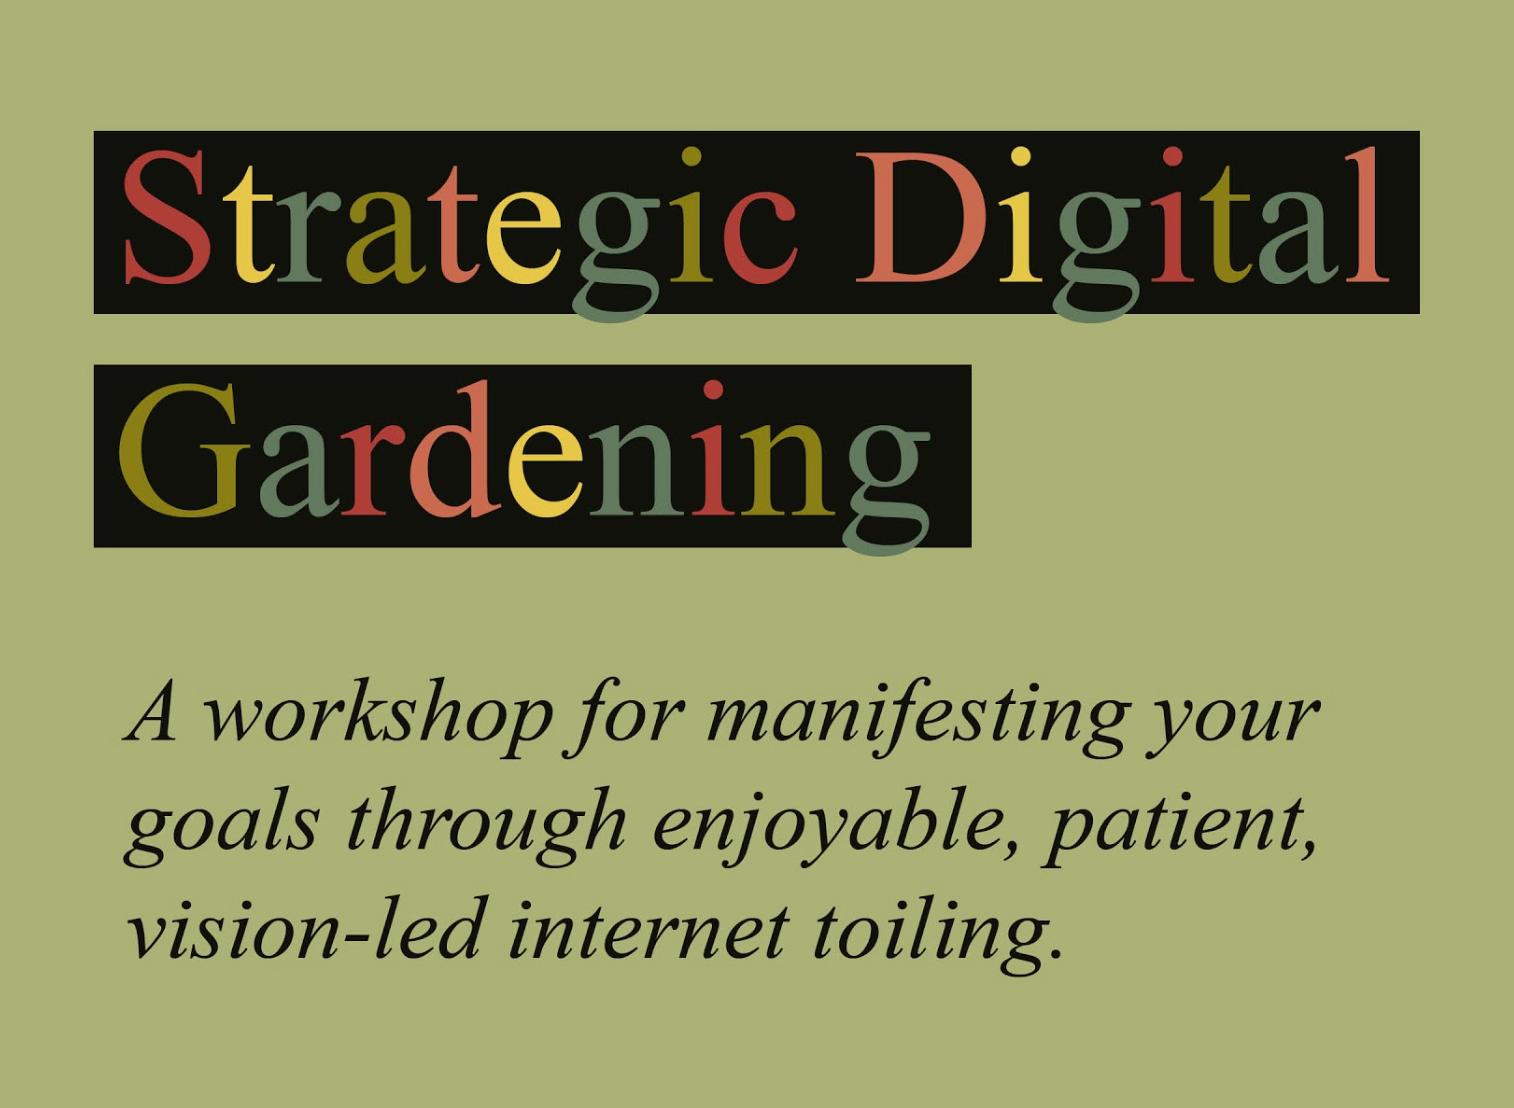 Strategic Digital Gardening